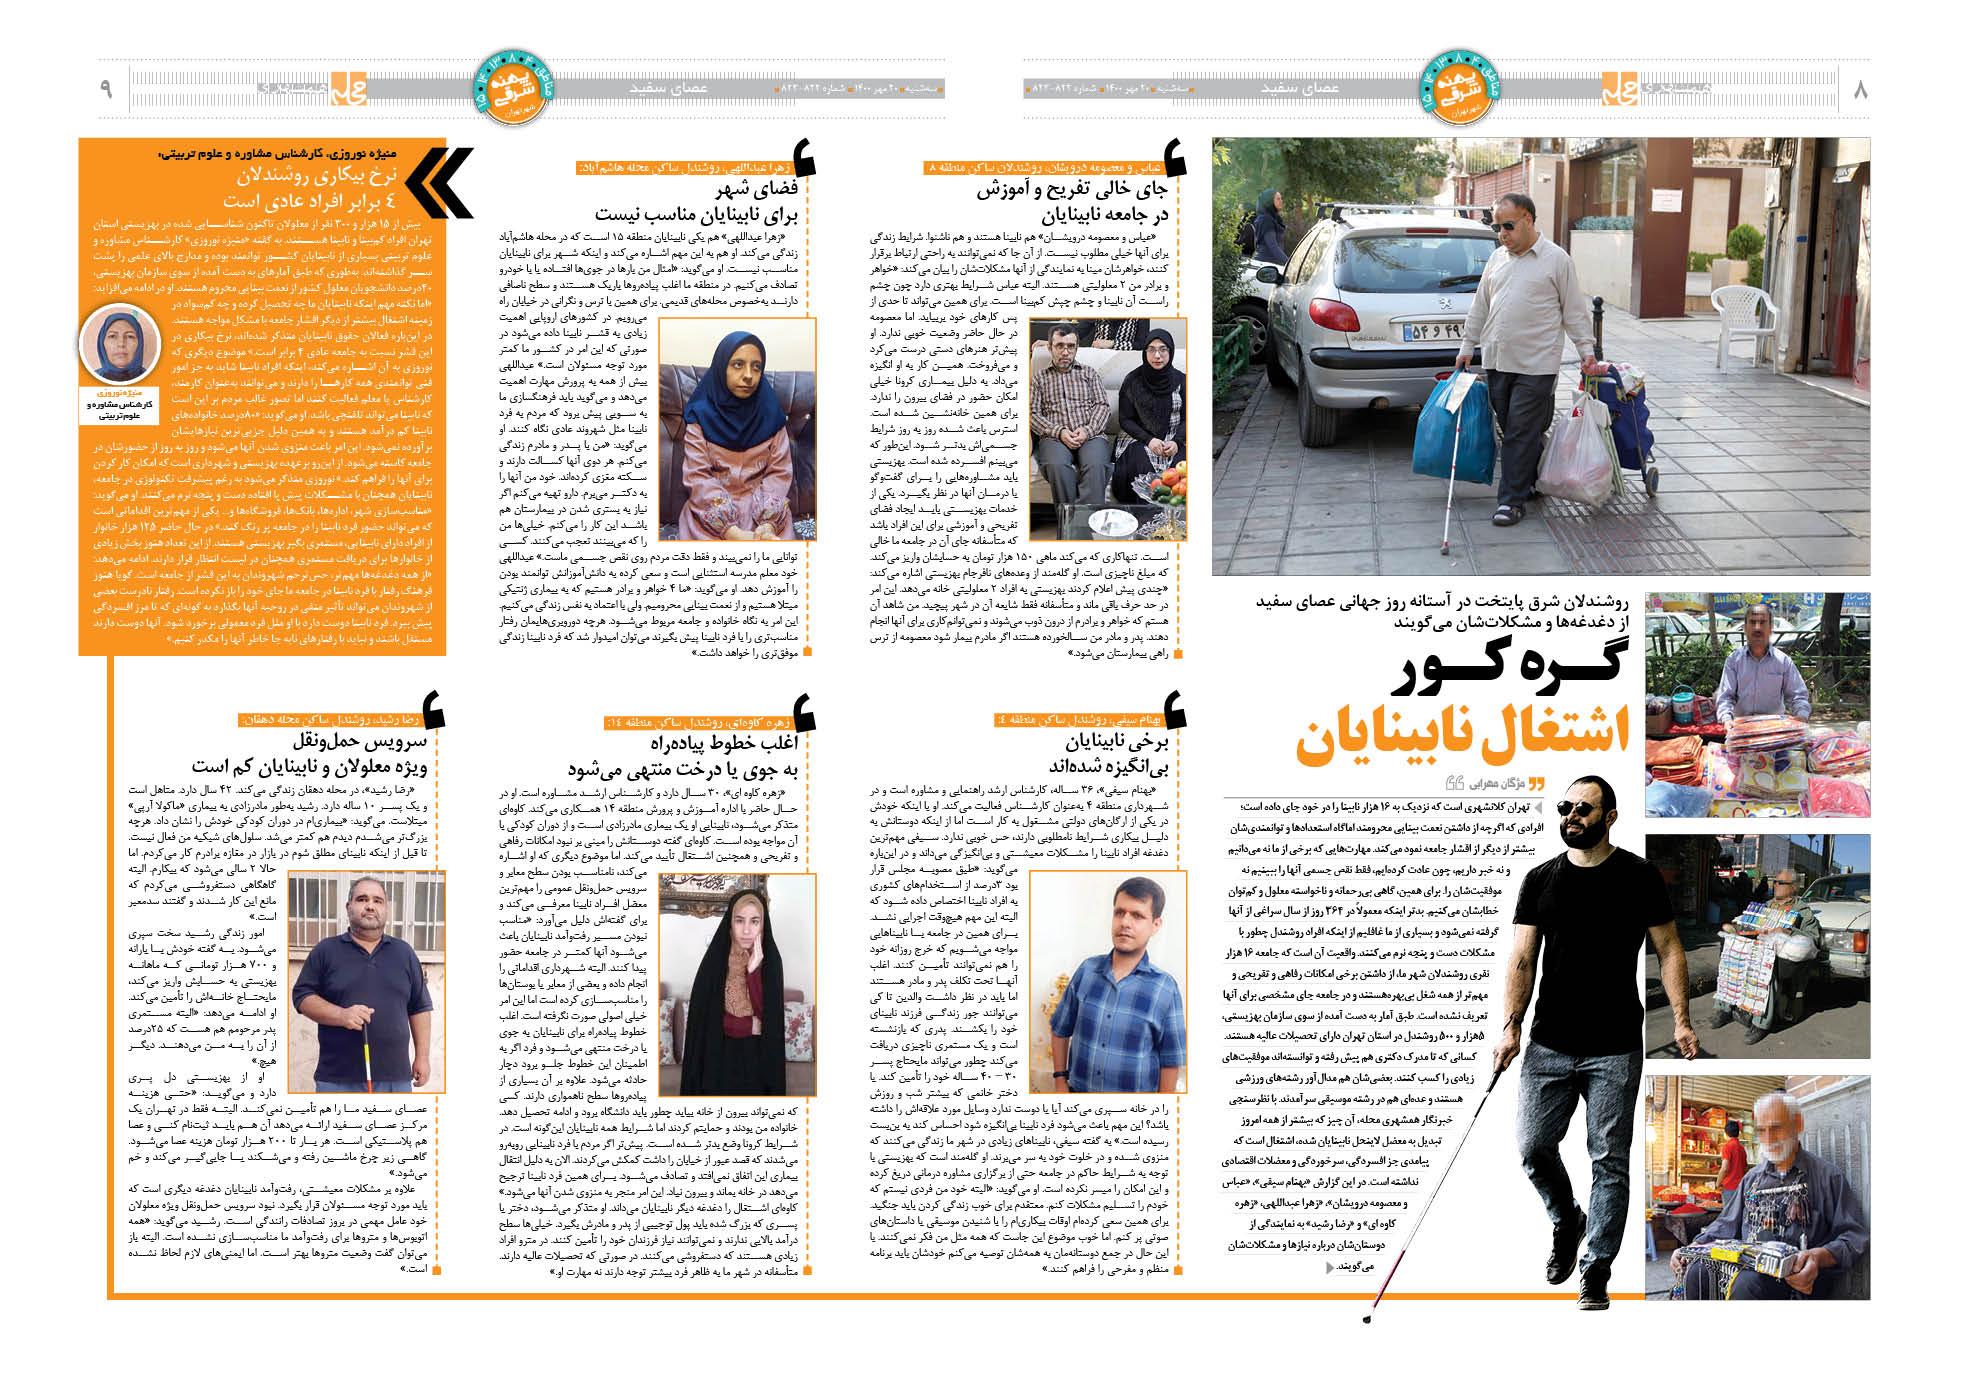 صفحه 9-8 محله